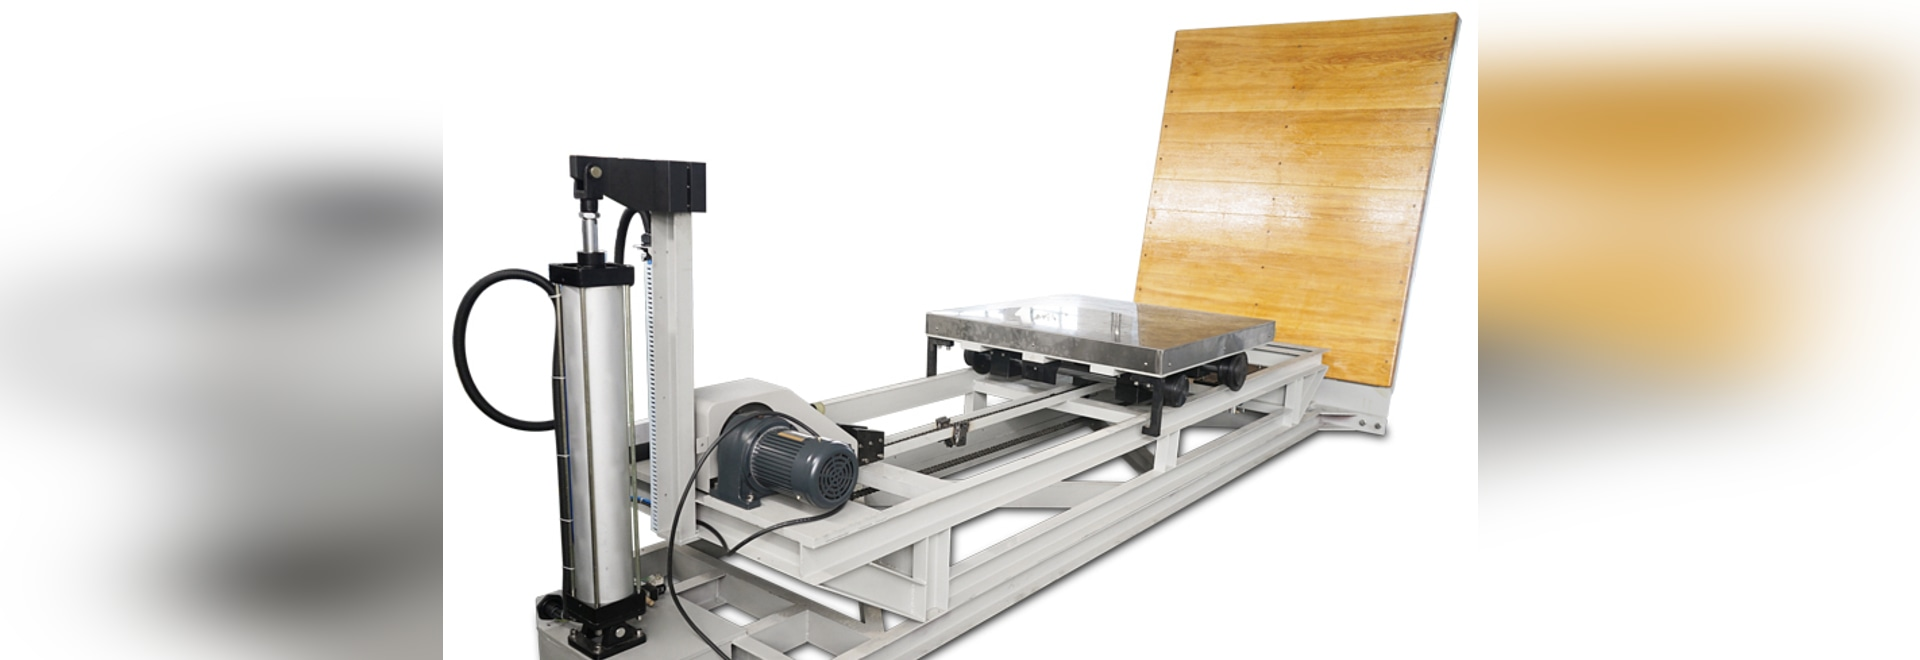 appareil de contrôle de empaquetage d'impact de pente